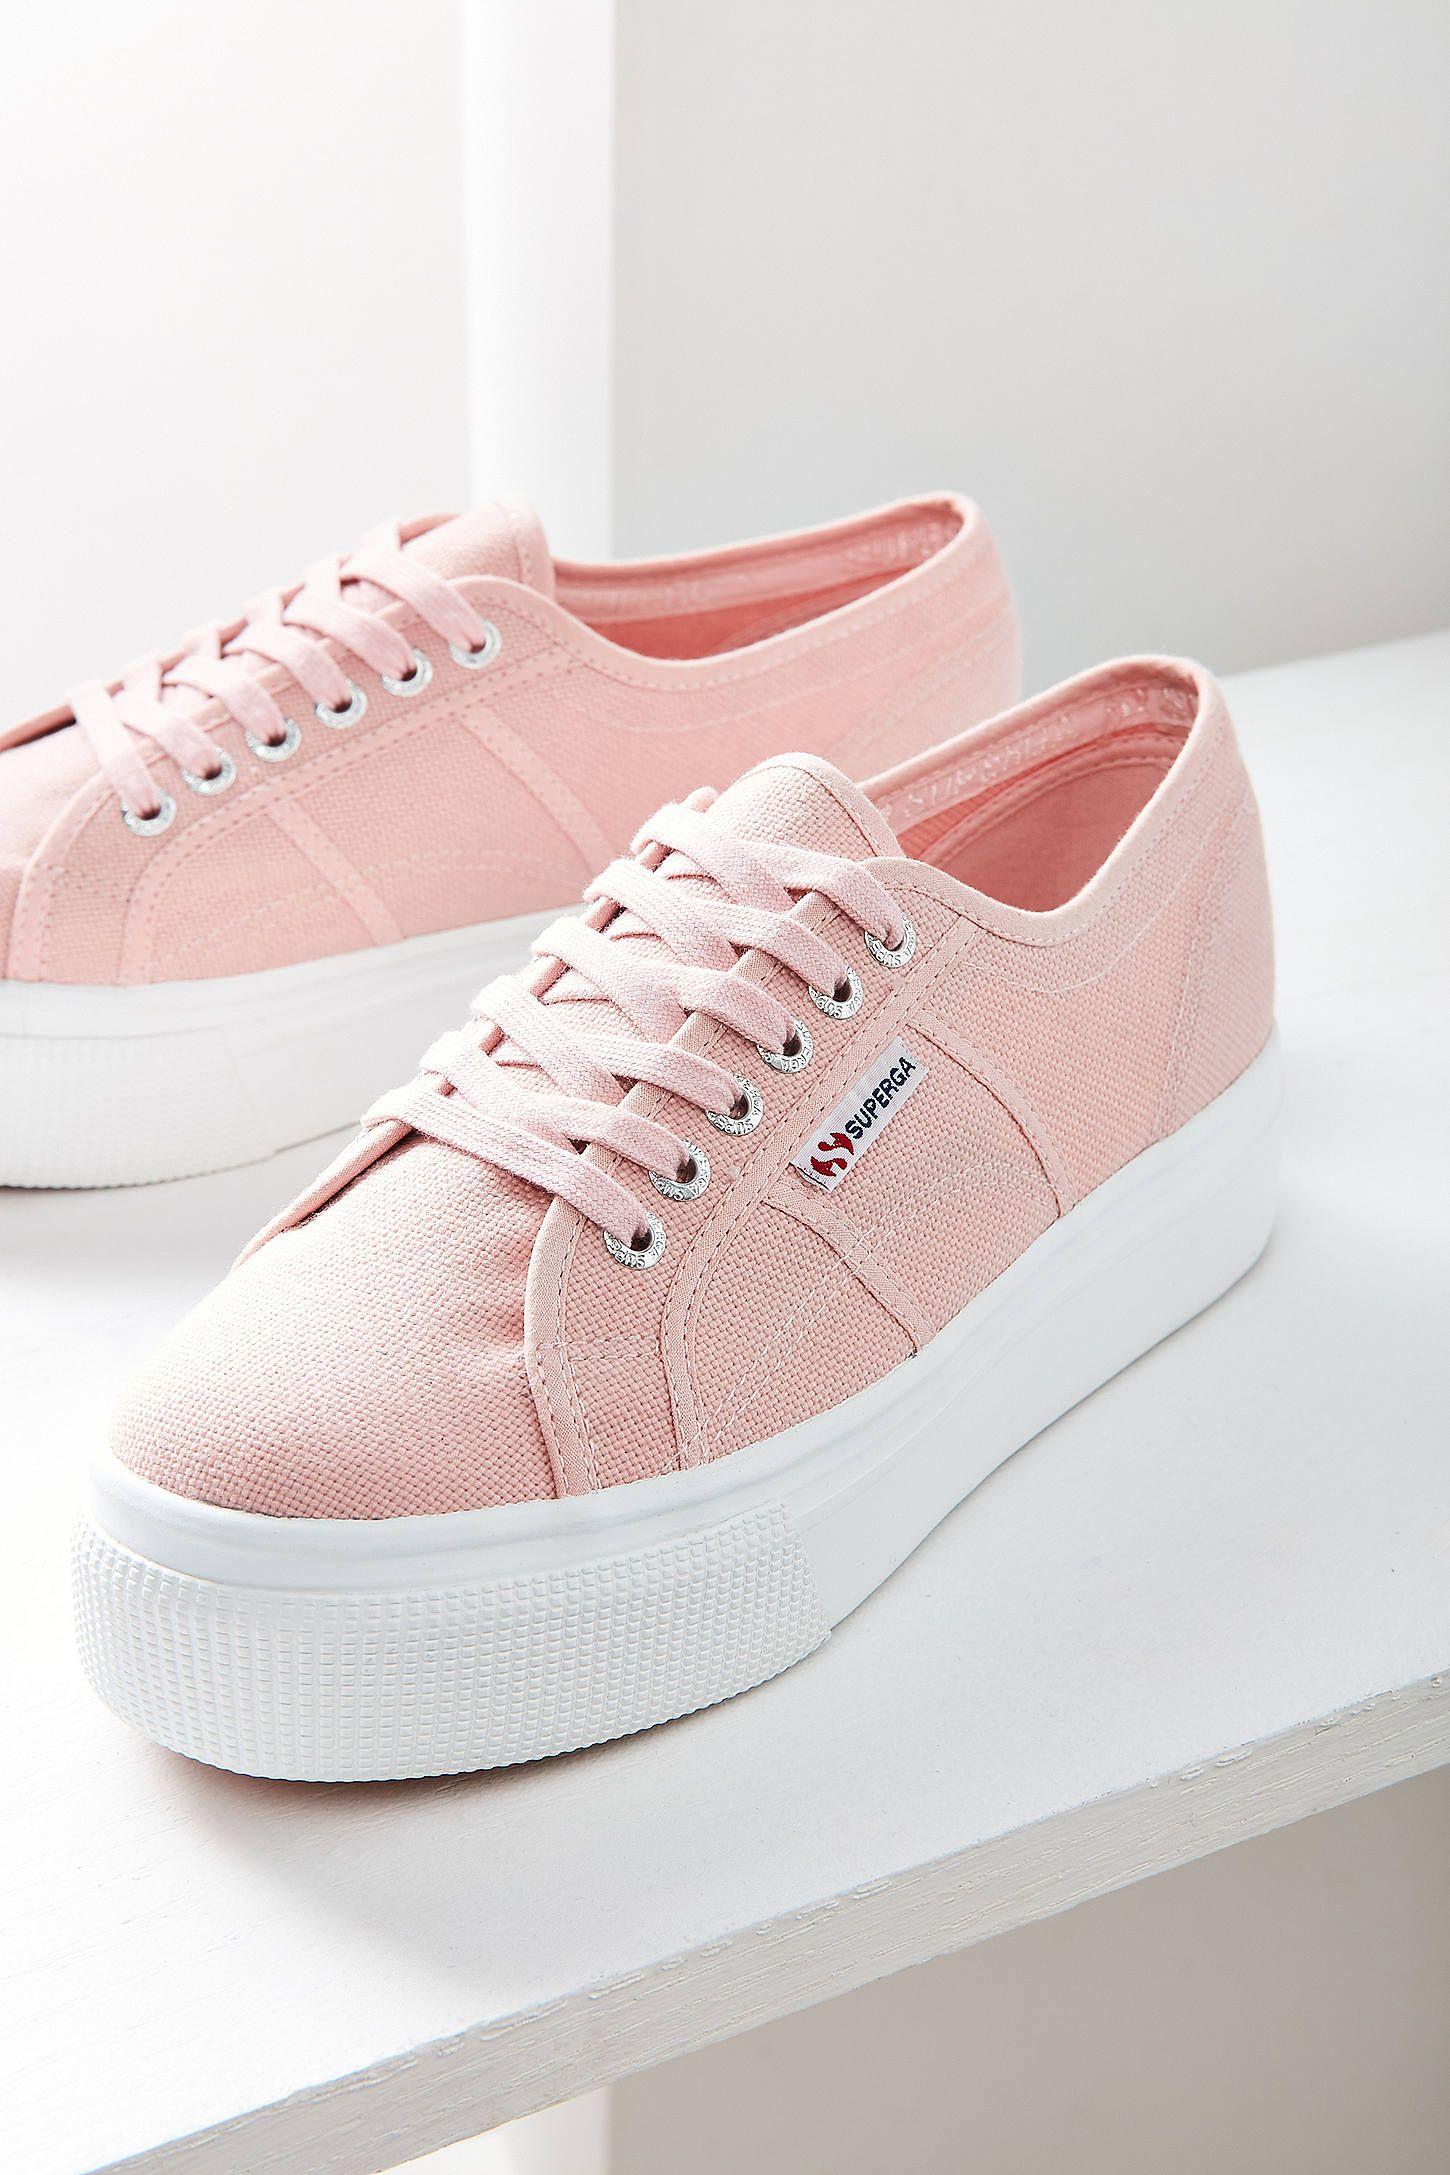 cb239a0ec1d Slide View  1  Superga 2790 Linea Platform Sneaker